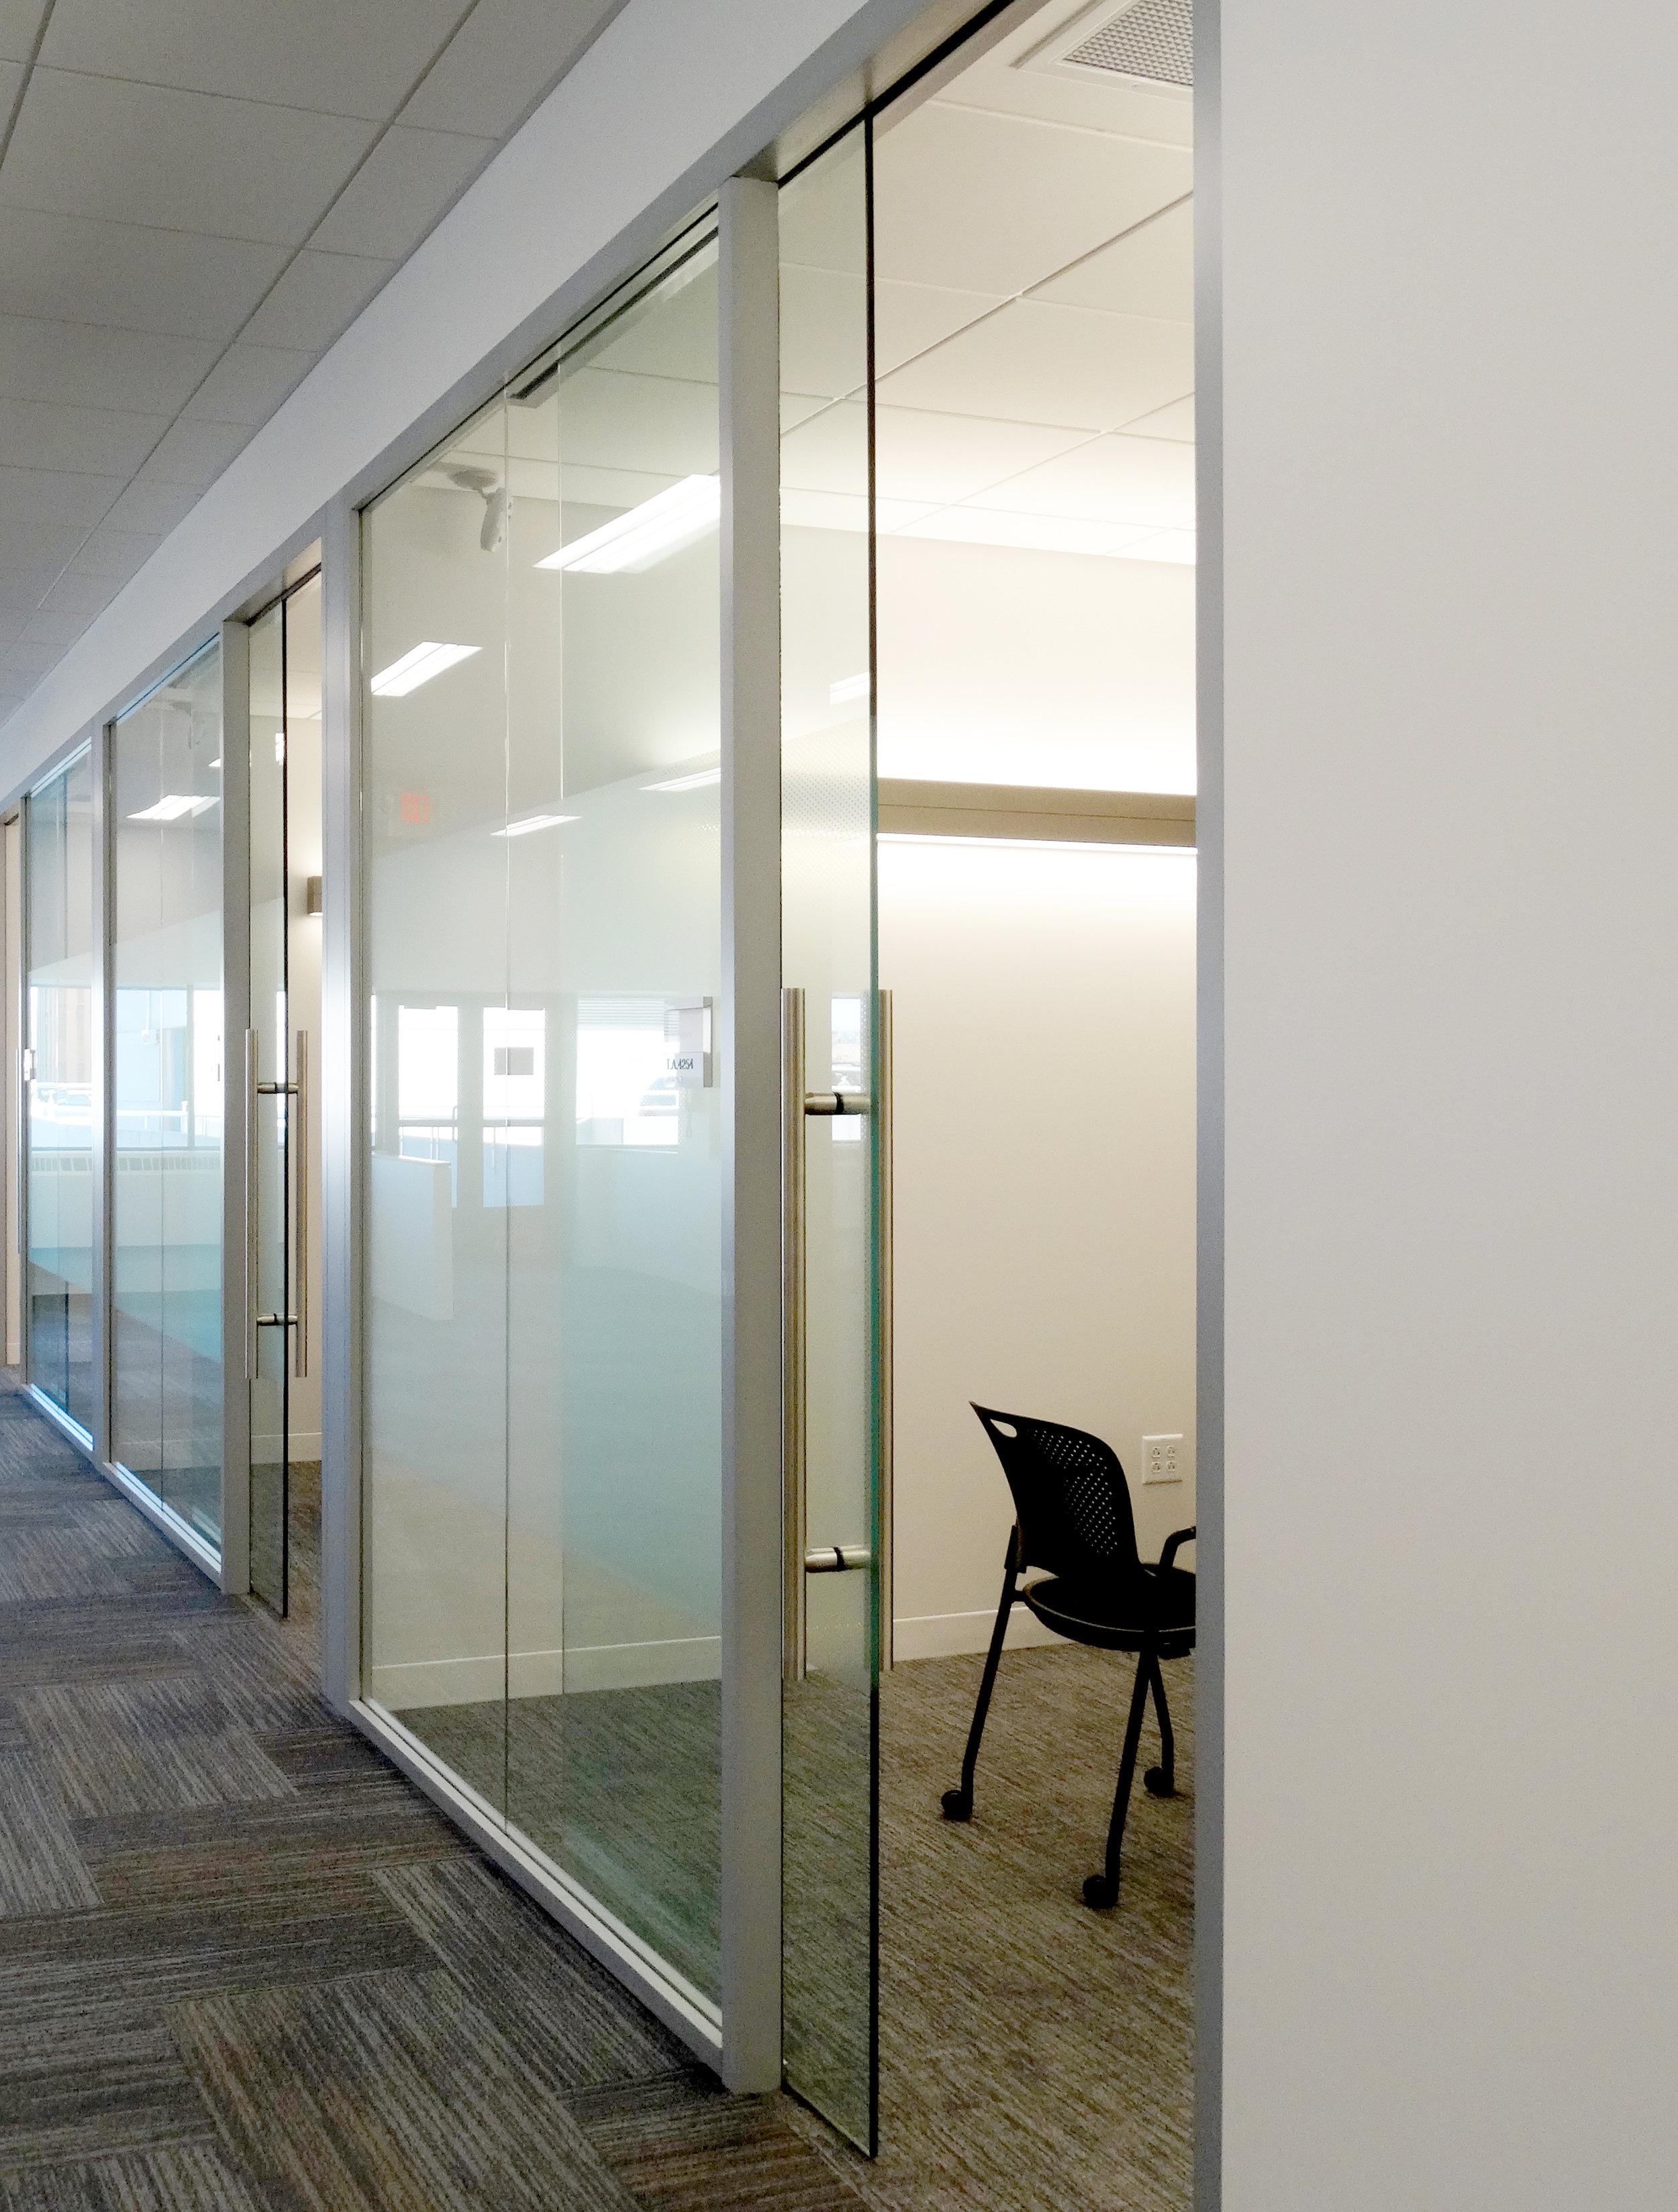 Litespace Frameless Glass Sliding Door Office Walls - Spaceworks AI.jpg